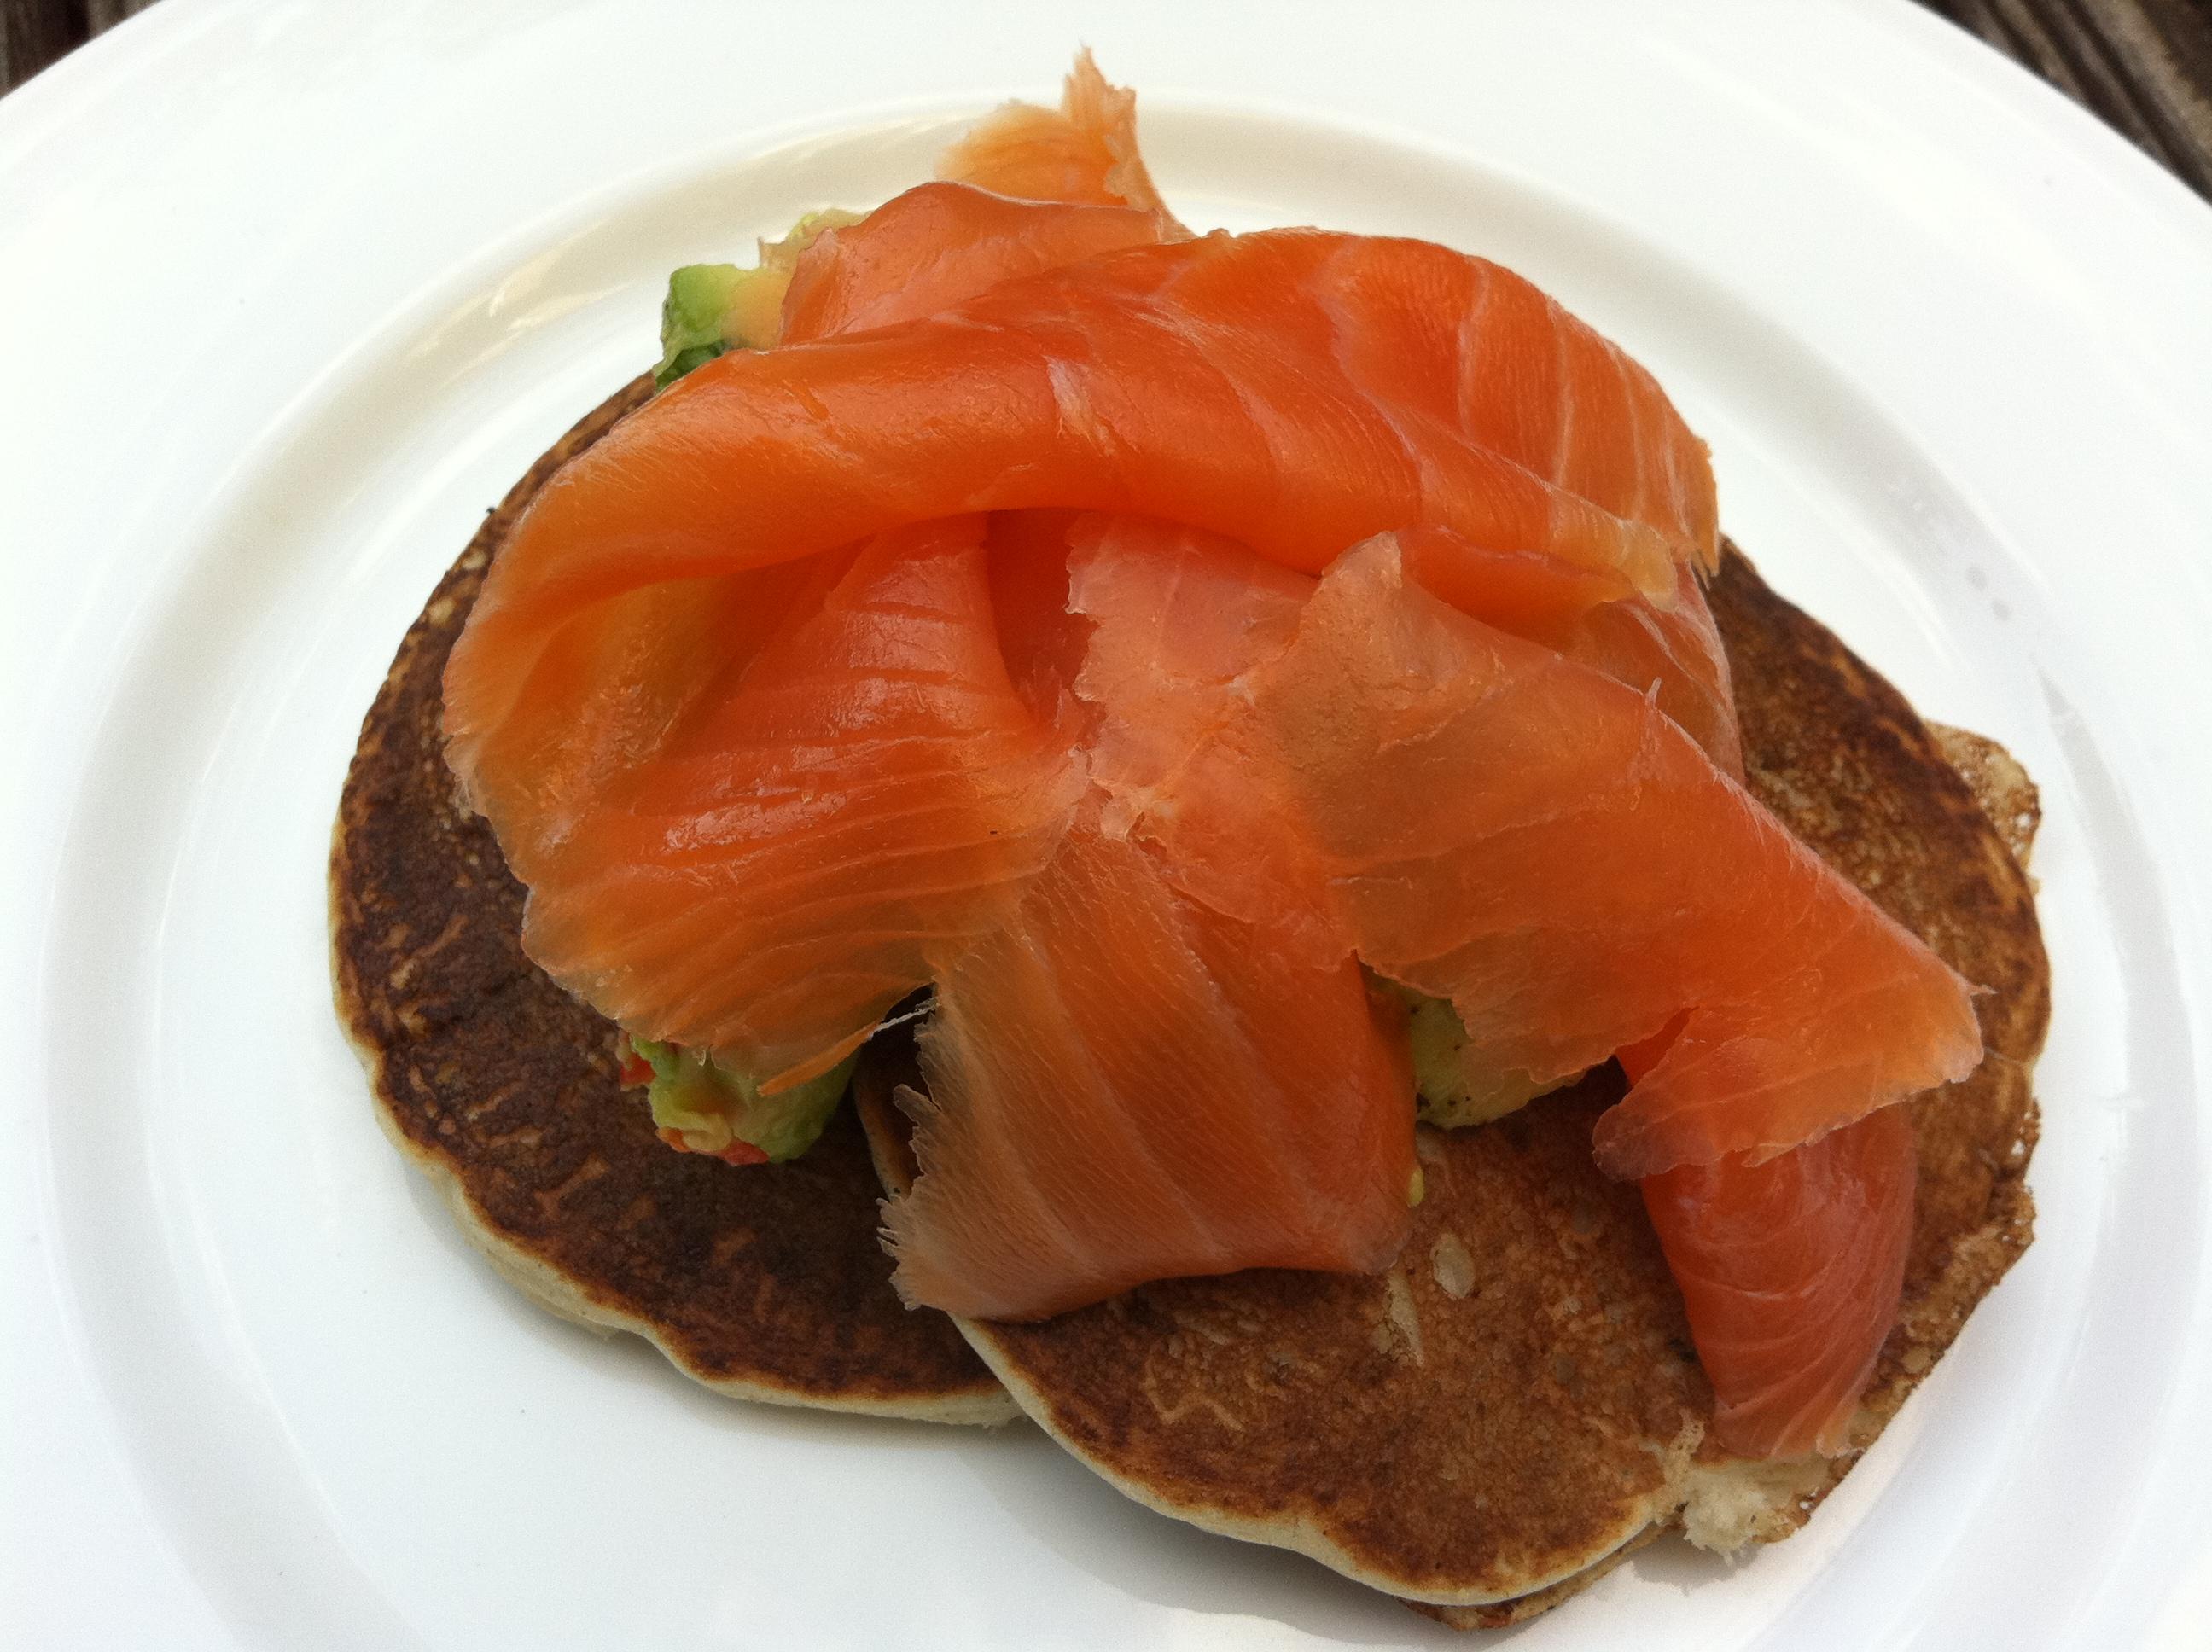 Buckwheat Pancakes With Smoked Salmon Recipes — Dishmaps